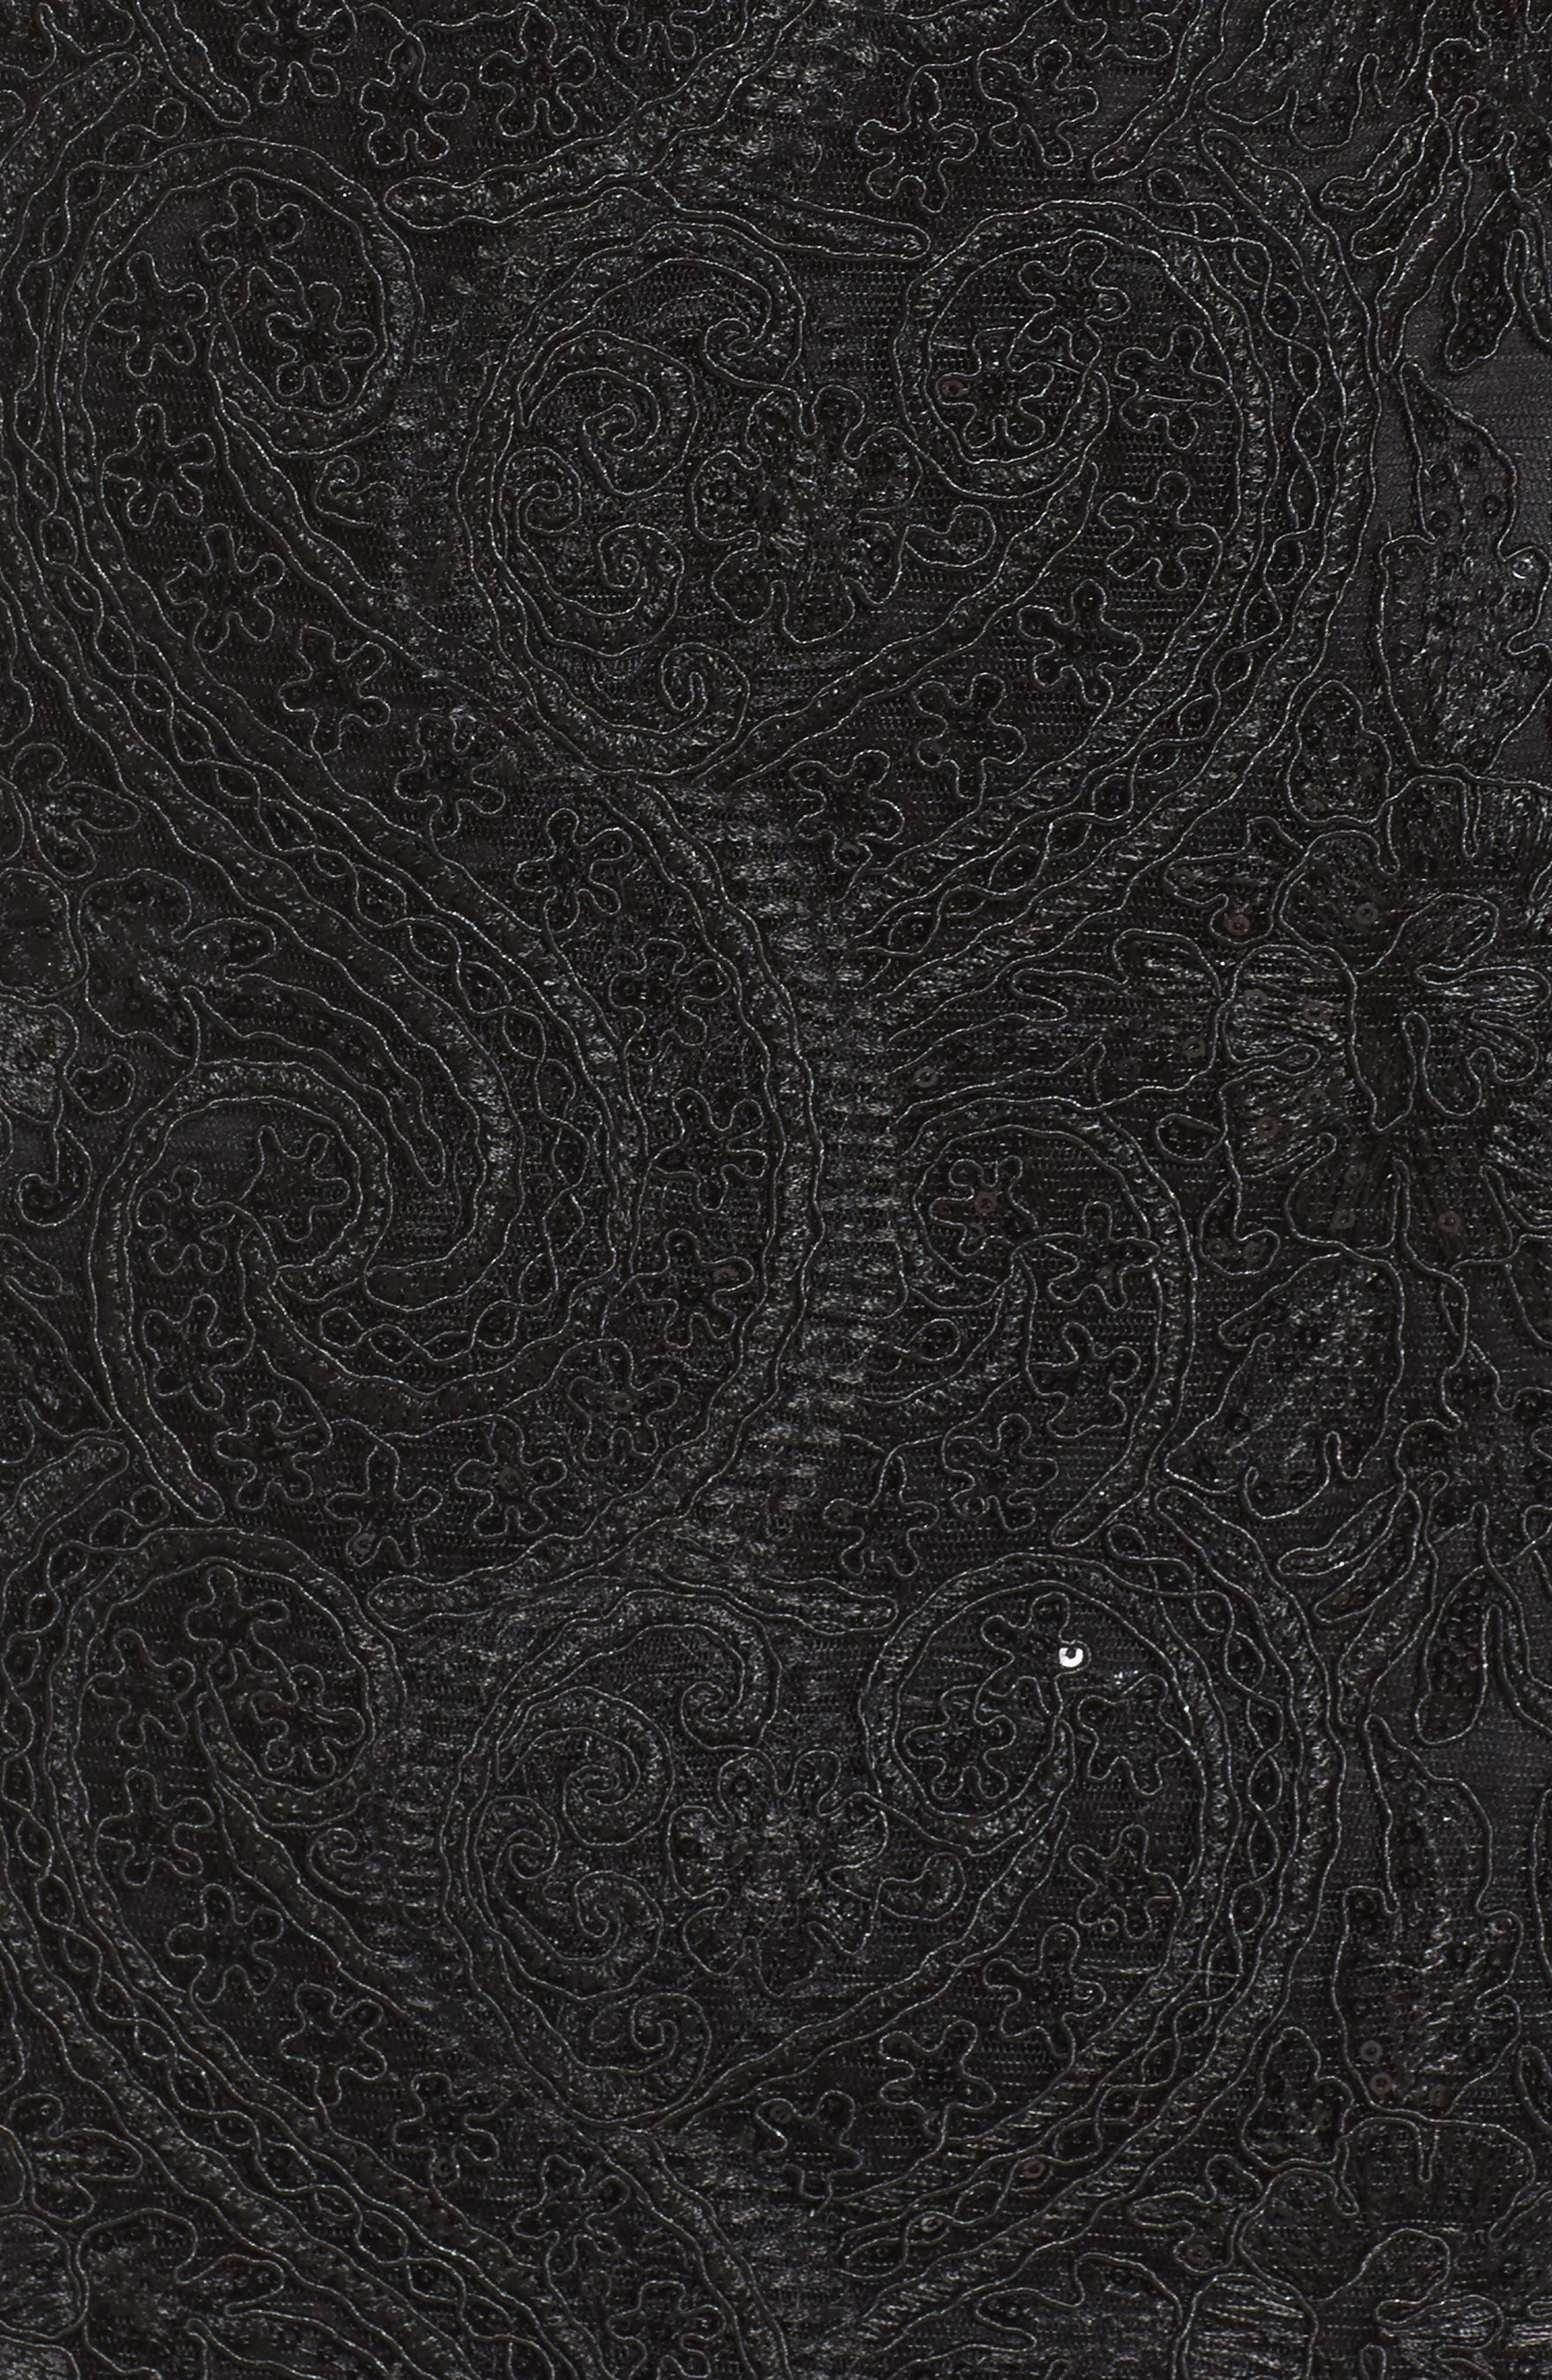 Illusion Neck Lace Sheath Dress,                             Alternate thumbnail 5, color,                             001